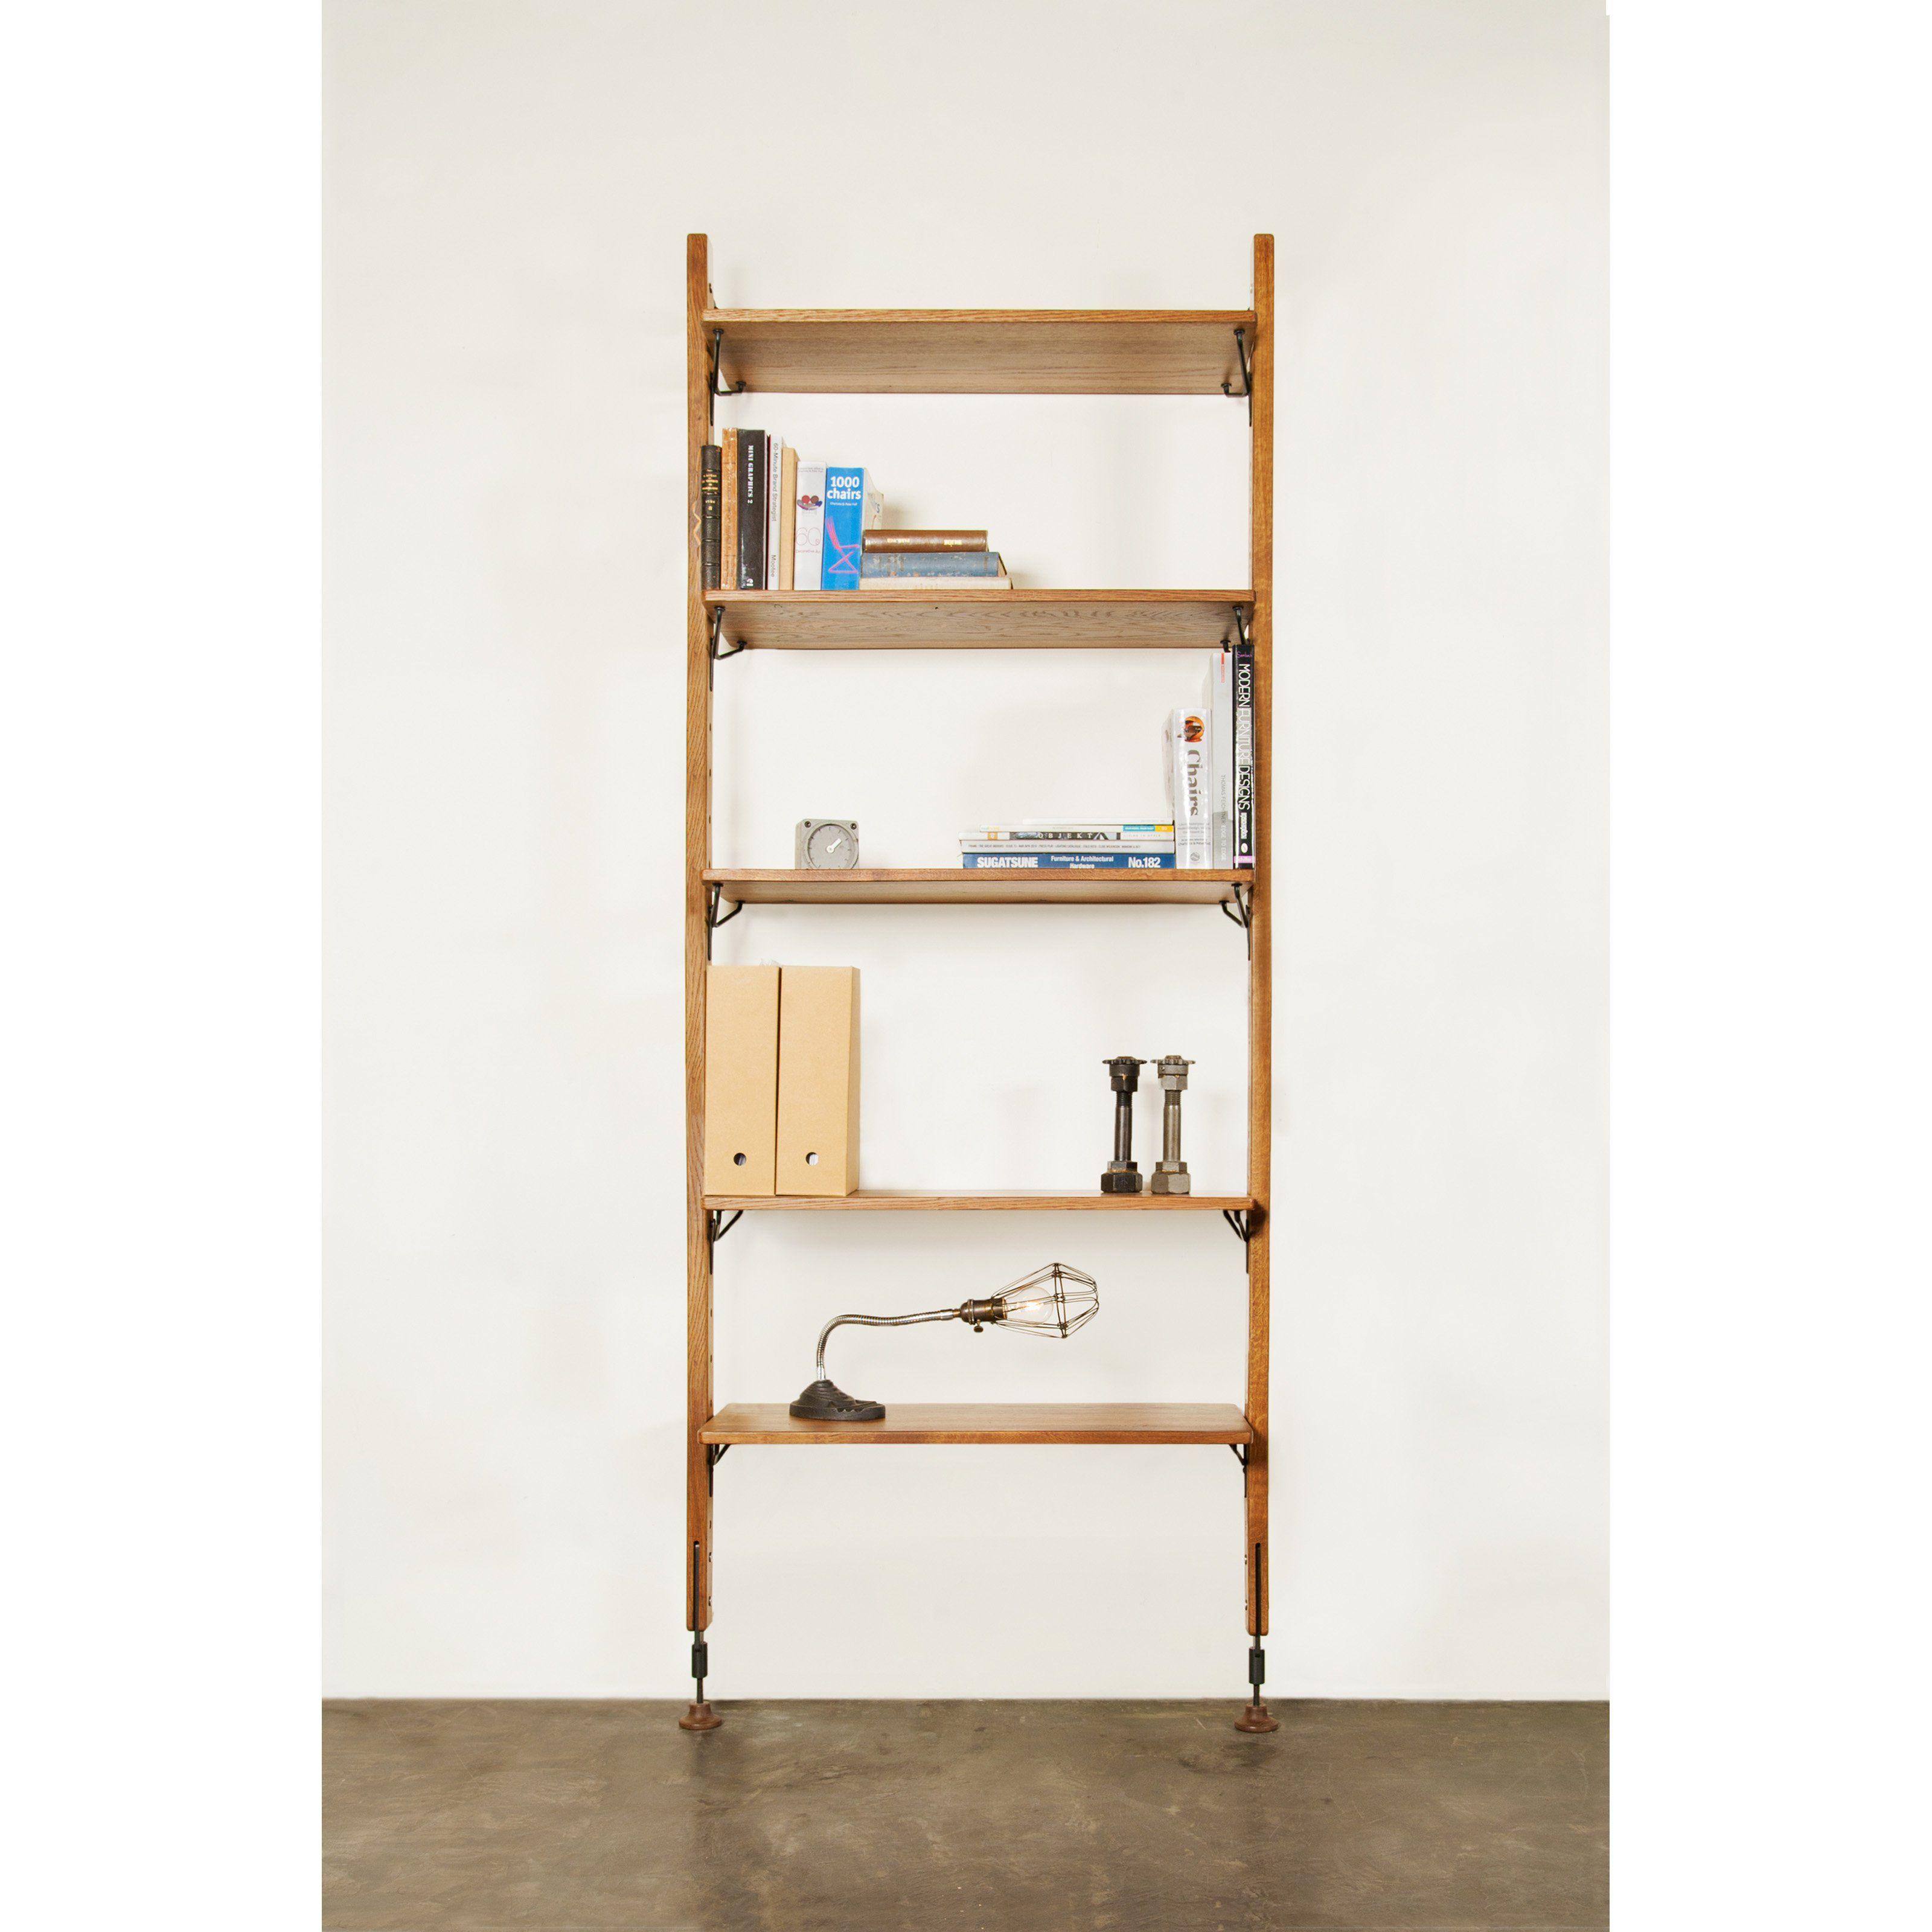 Nuevo Theo Ladder Book Shelf - HGDA449